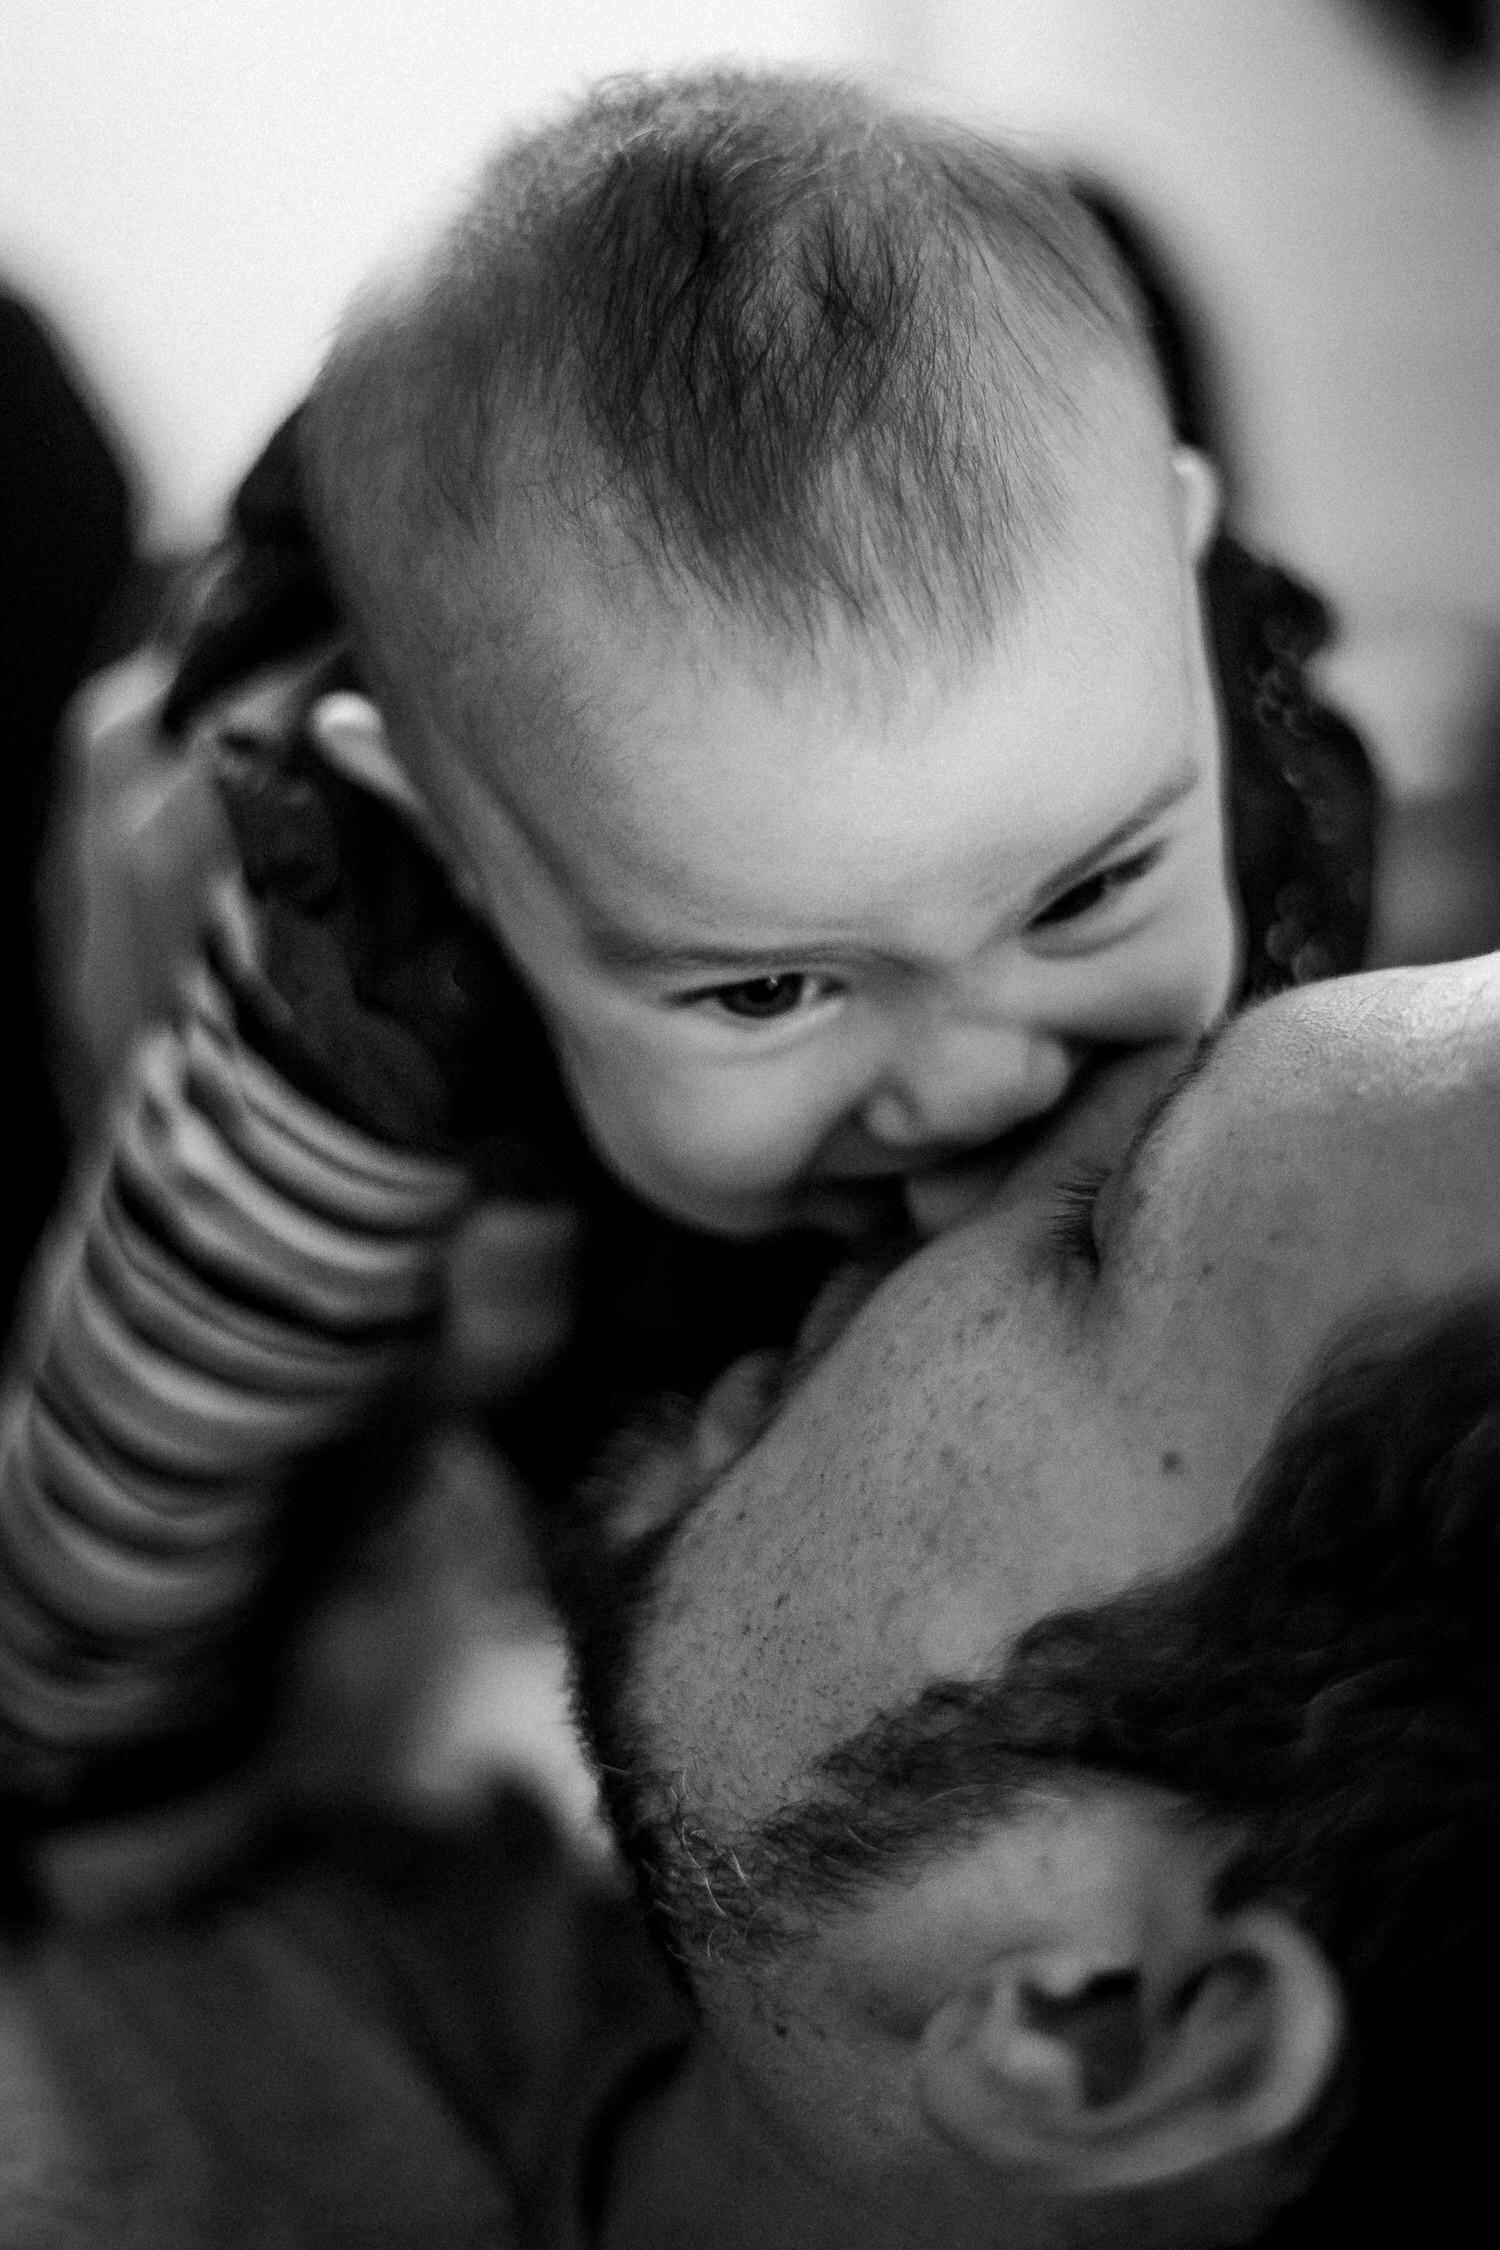 Baby mit Vater